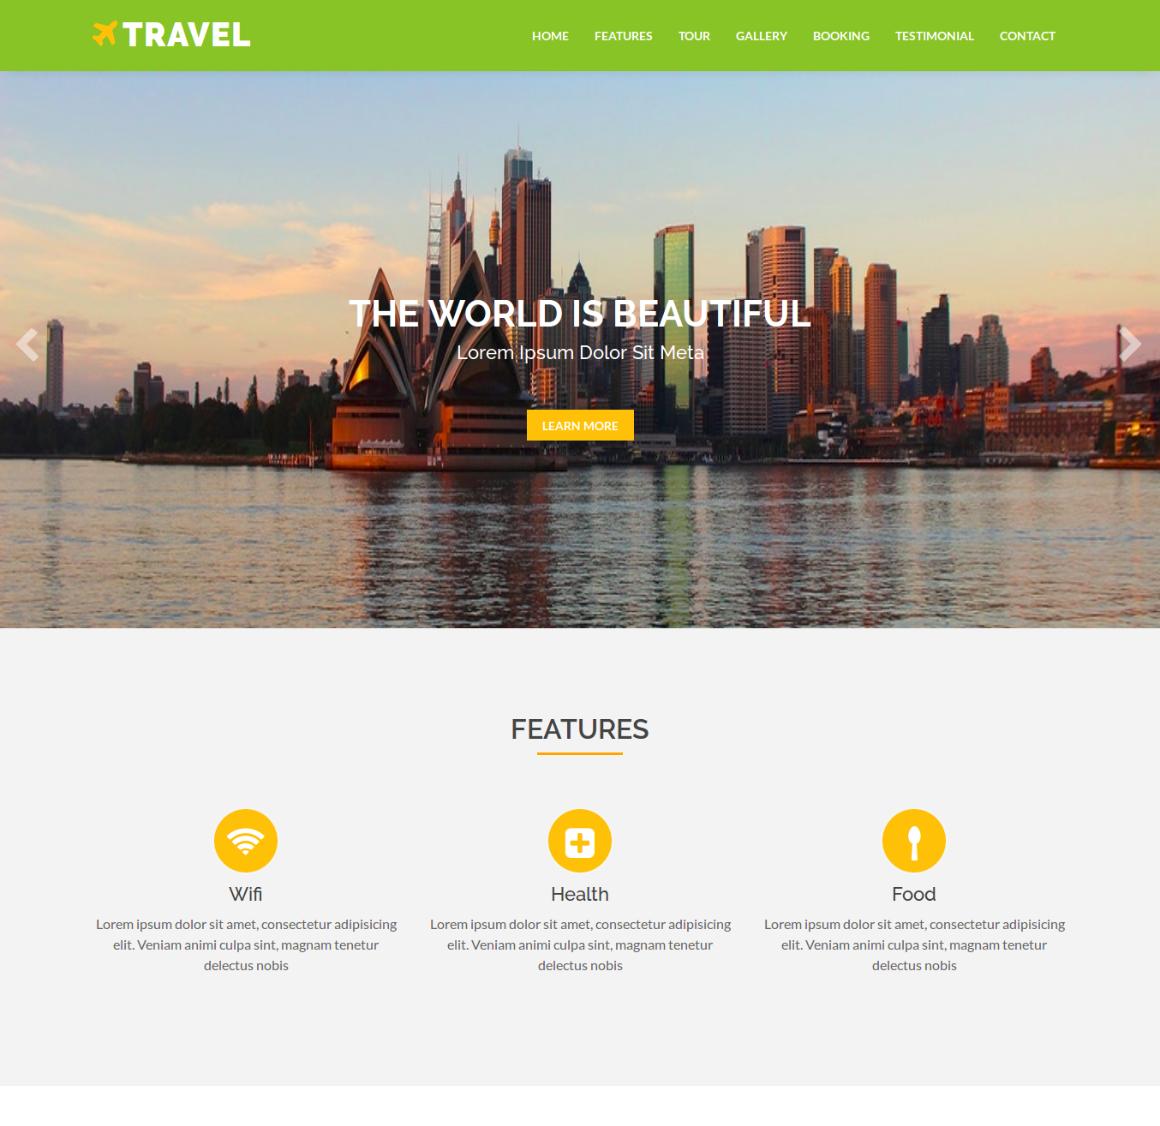 35 Premium HTML Landing Templates - $12 - travel